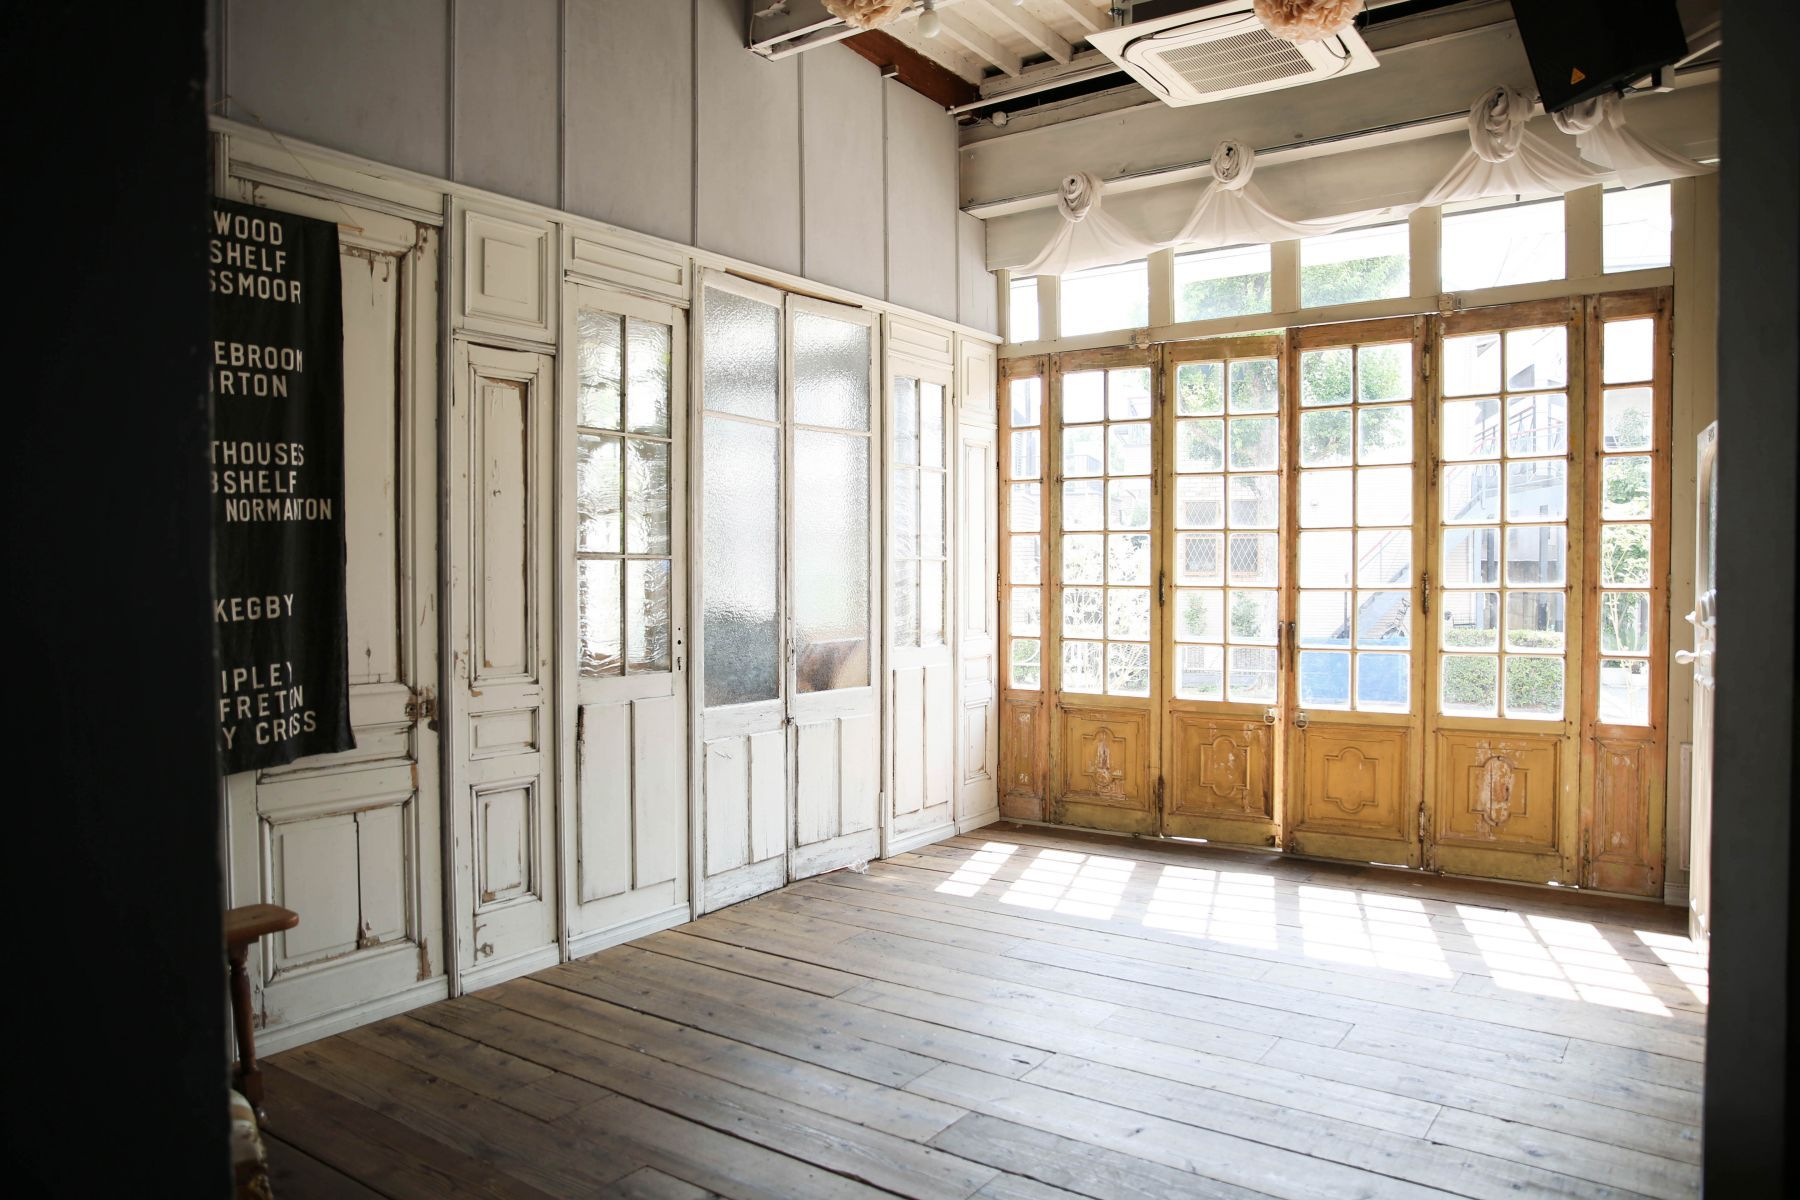 studio itto 目黒碑文谷1Fst (スタジオ イット)西陽の入る大きな窓と白扉